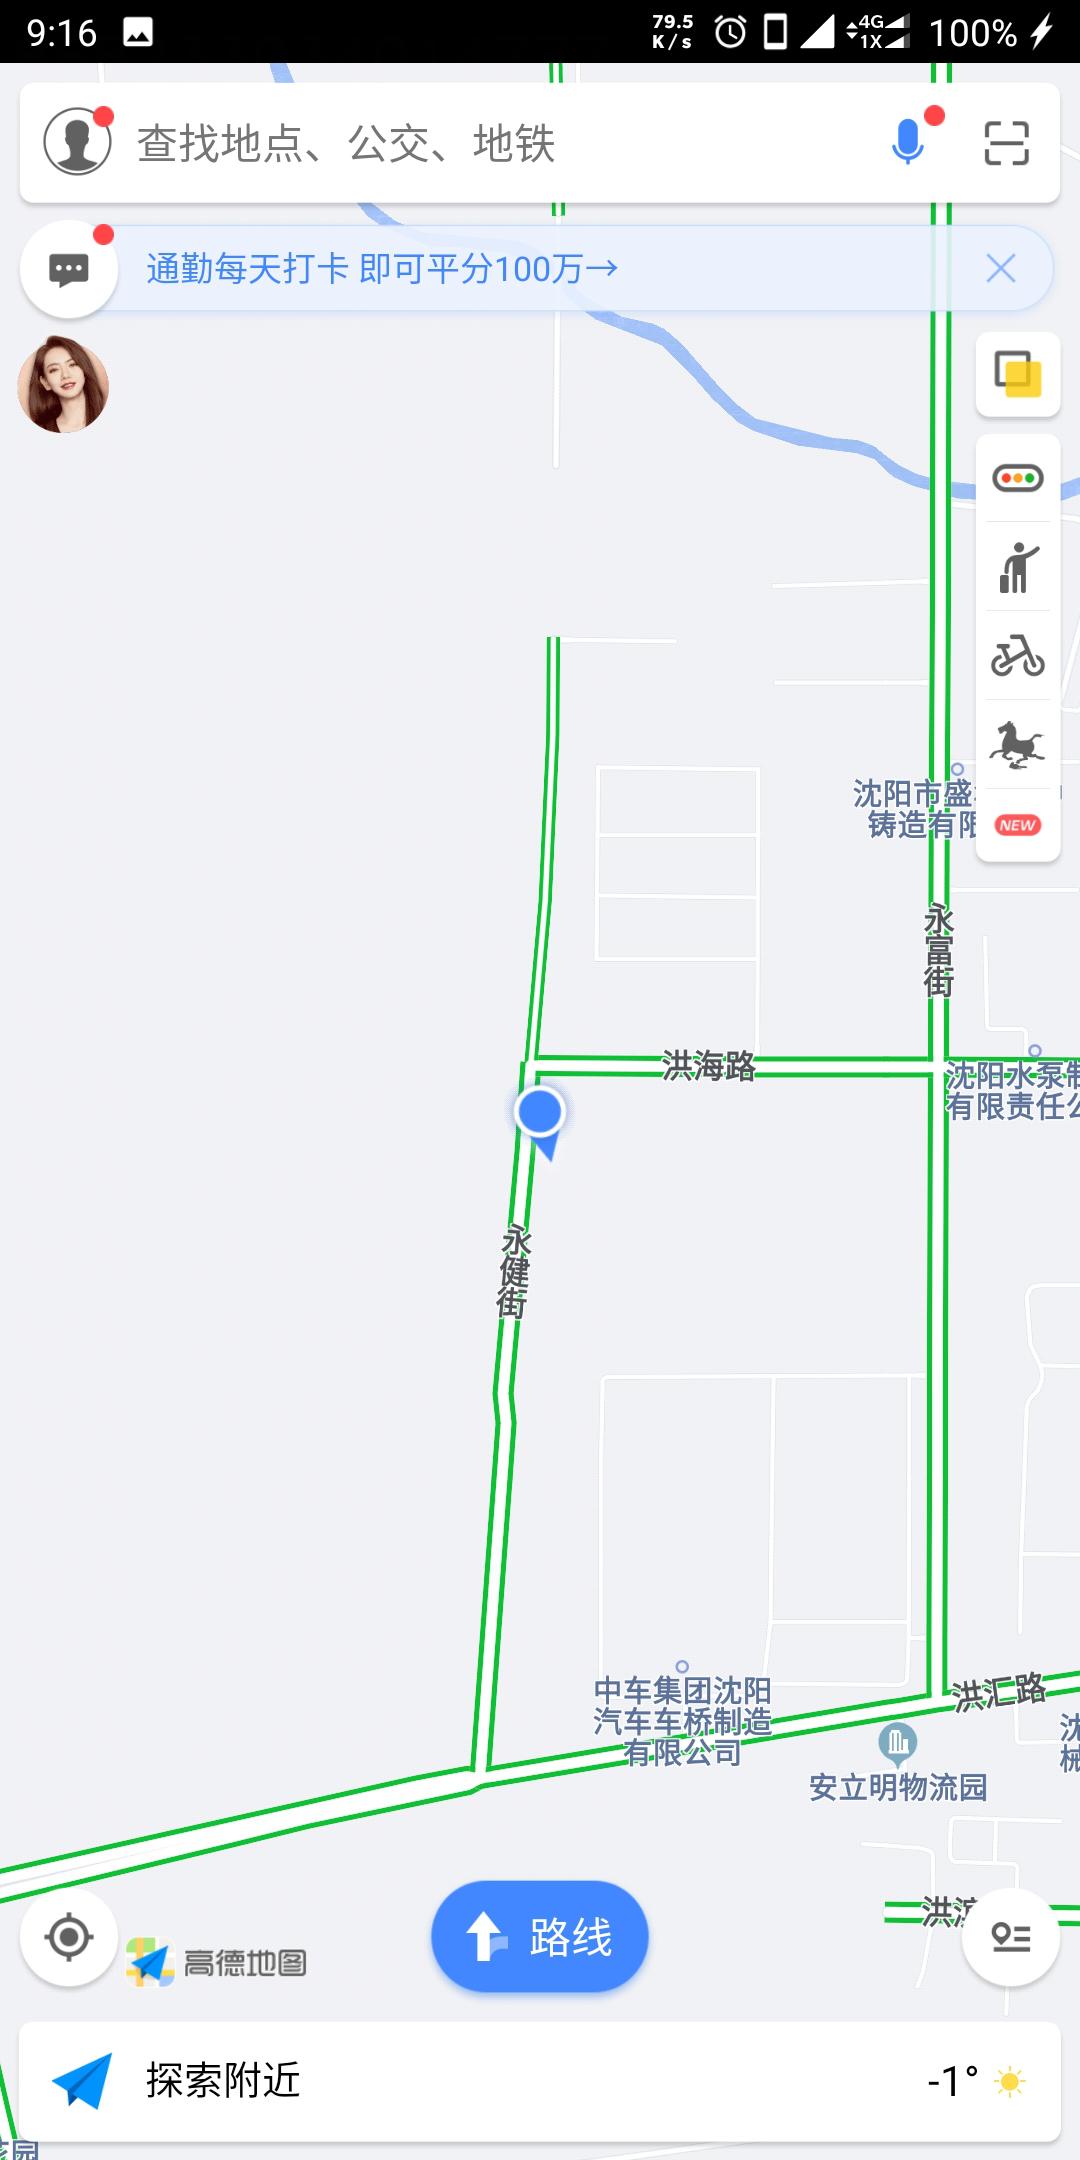 Screenshot_20190313-091633.png